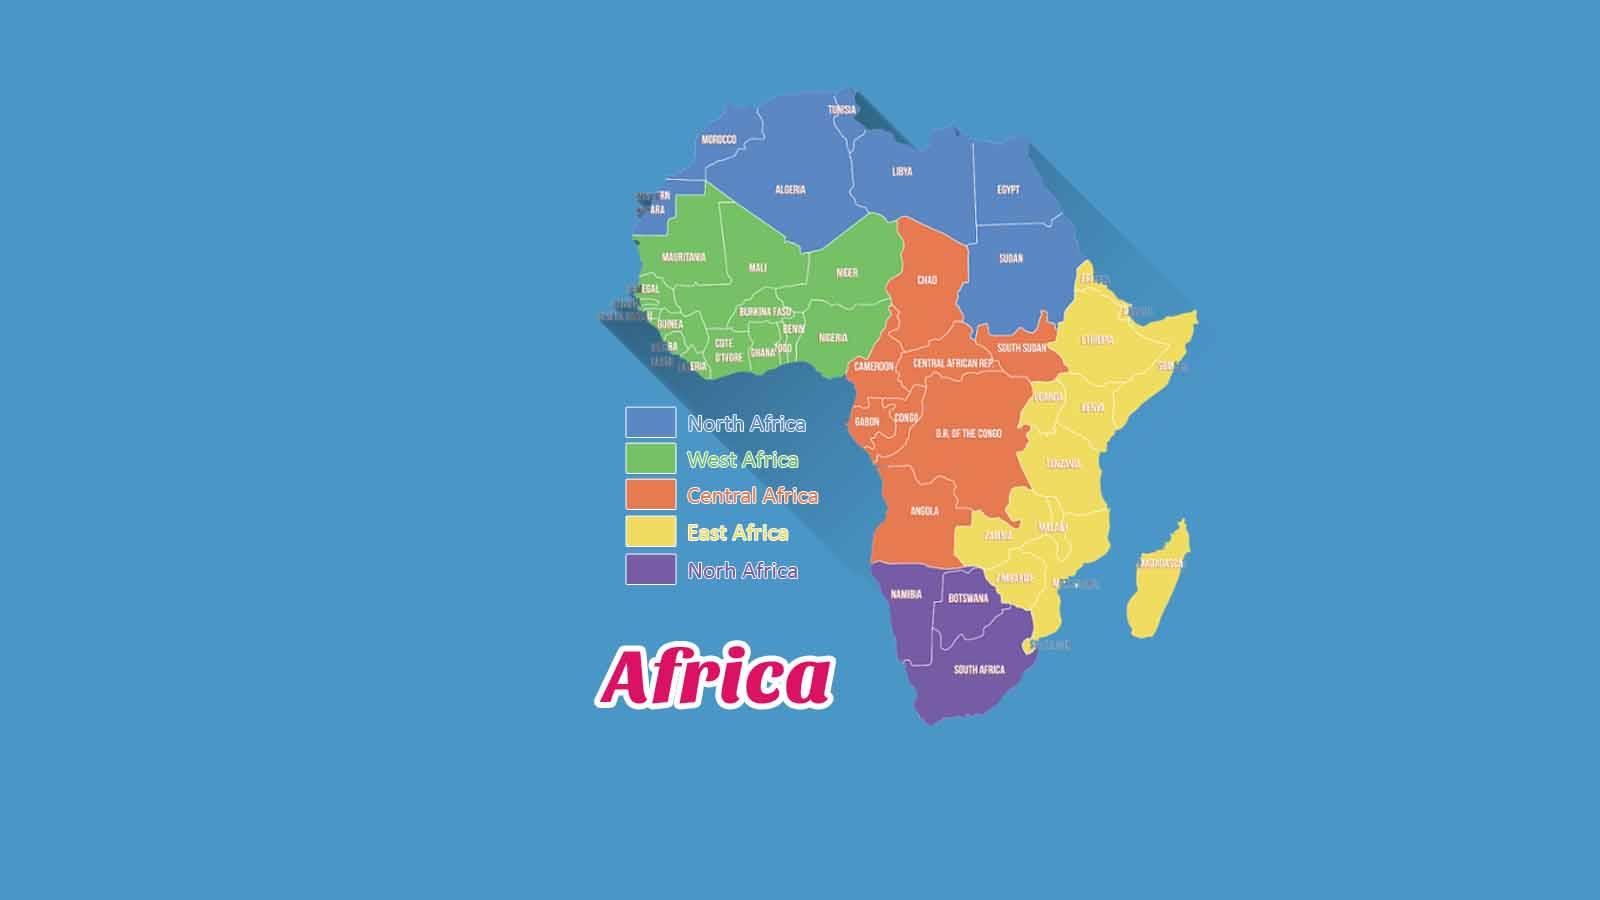 Kosakata Bahasa Inggris Negara Di Benua Afrika Disertai Gambar